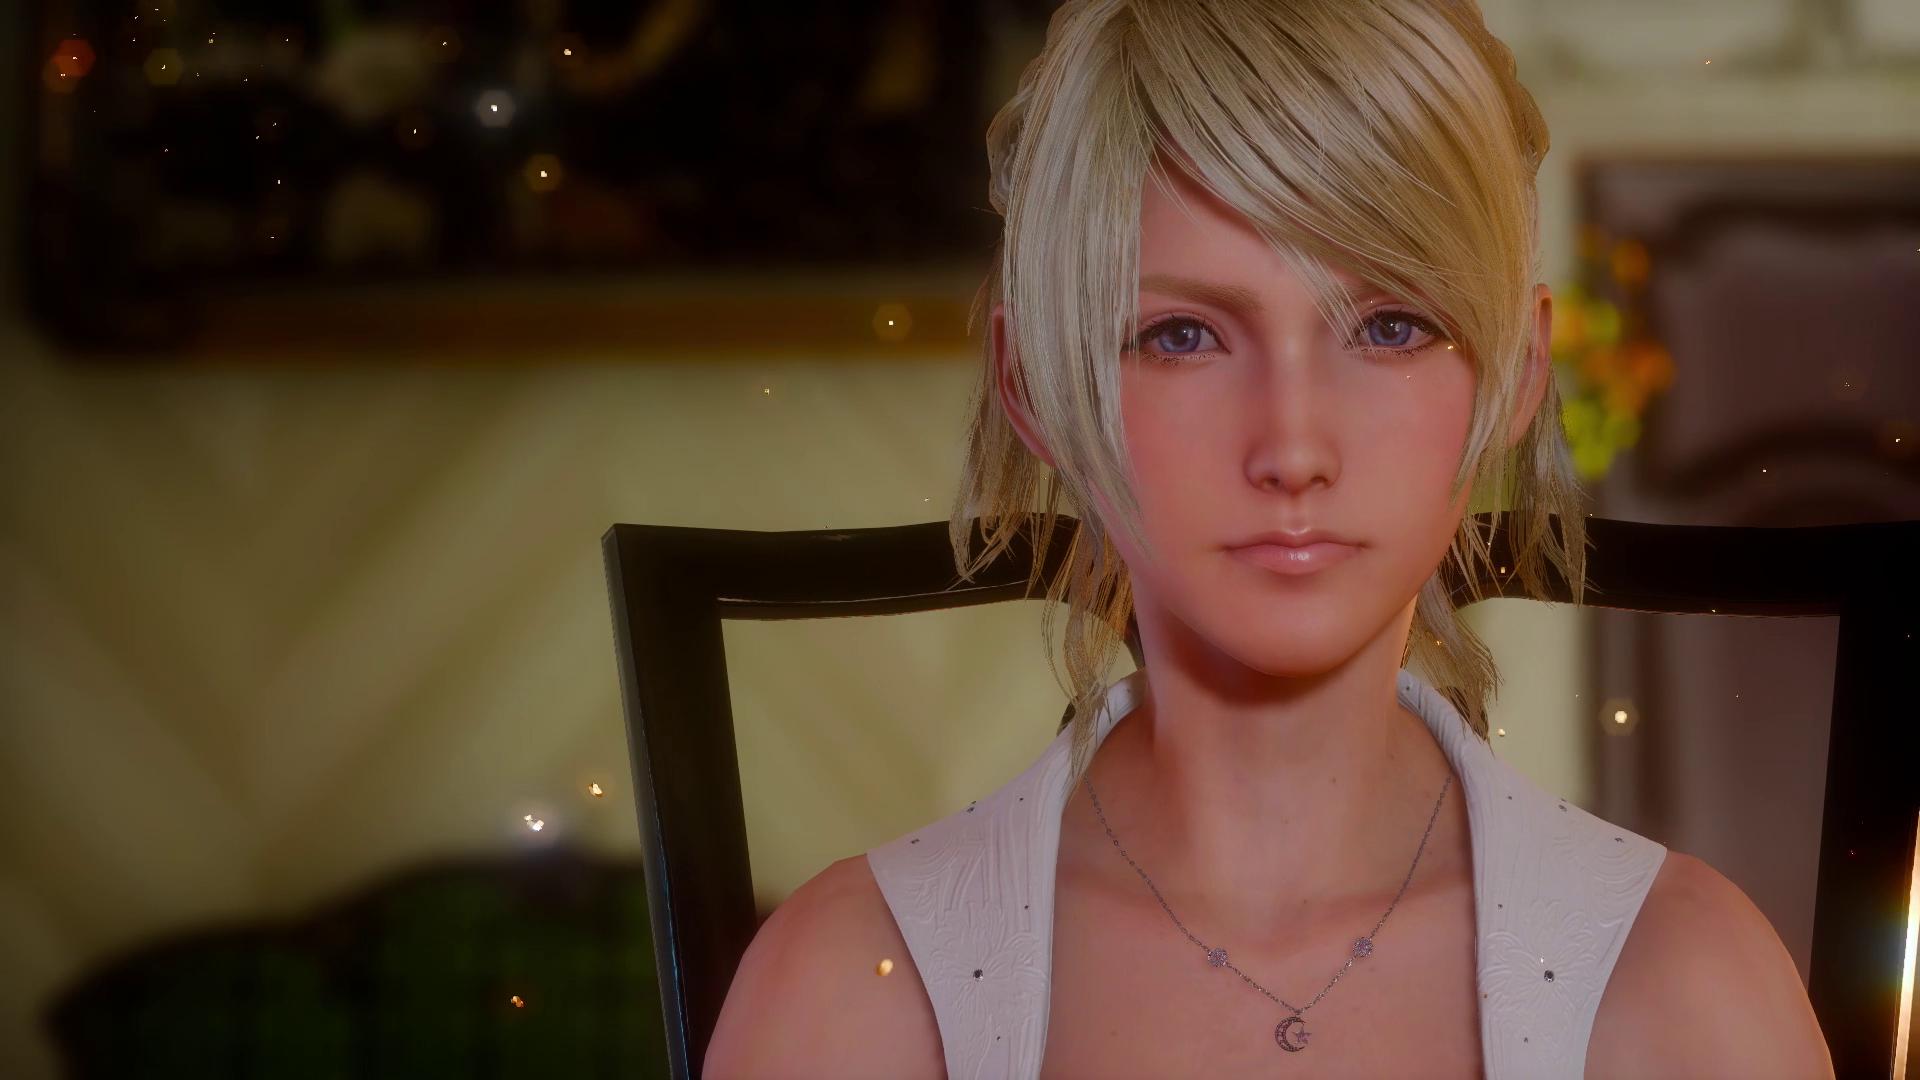 [Alerta de treta]O colar de Luna Final Fantasy XV Vlcsnap-2014-09-18-05h28m10s39